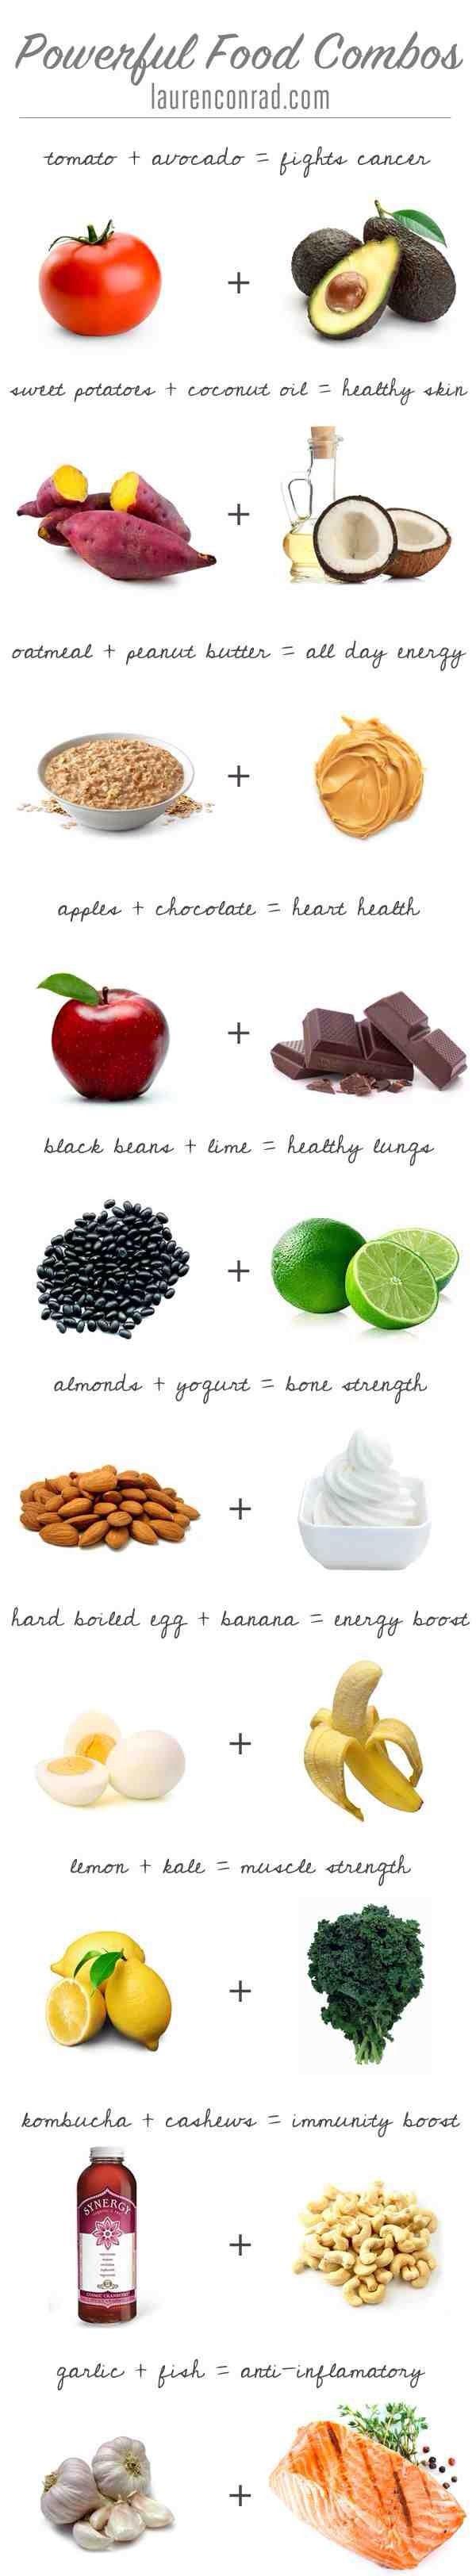 Powerful food combos